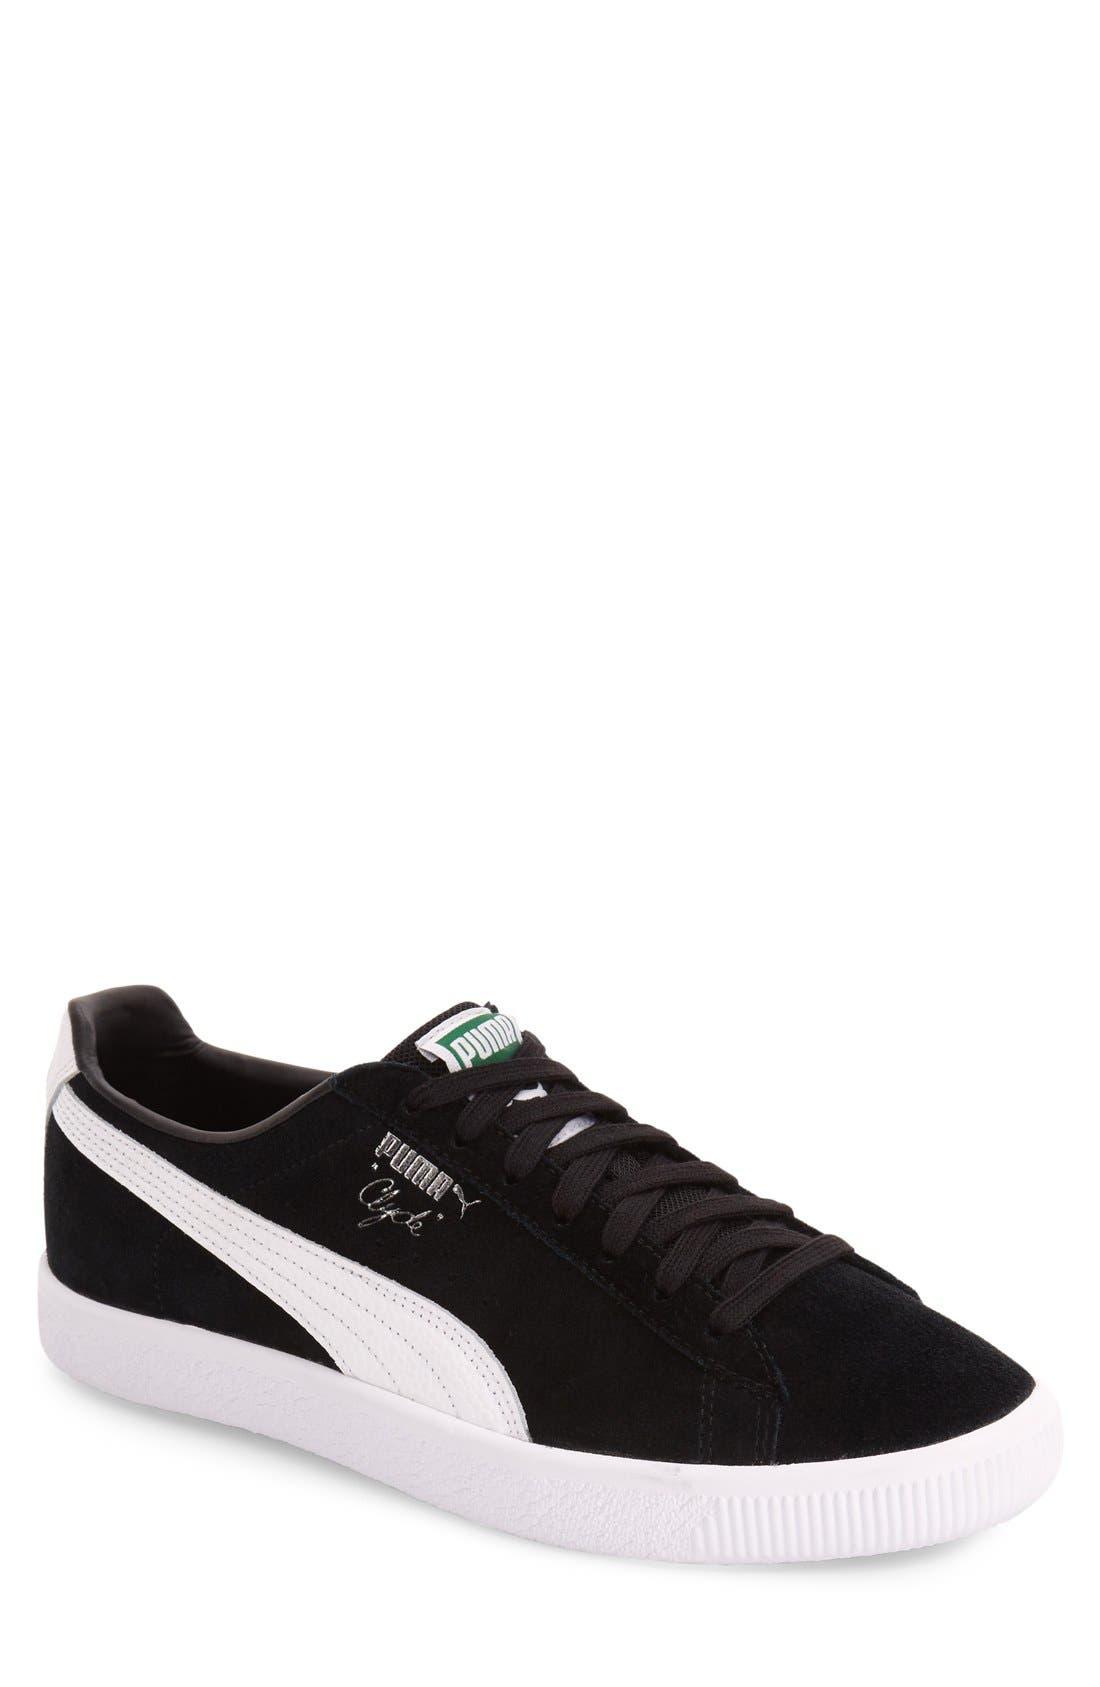 'Clyde B&C' Sneaker, Main, color, 001